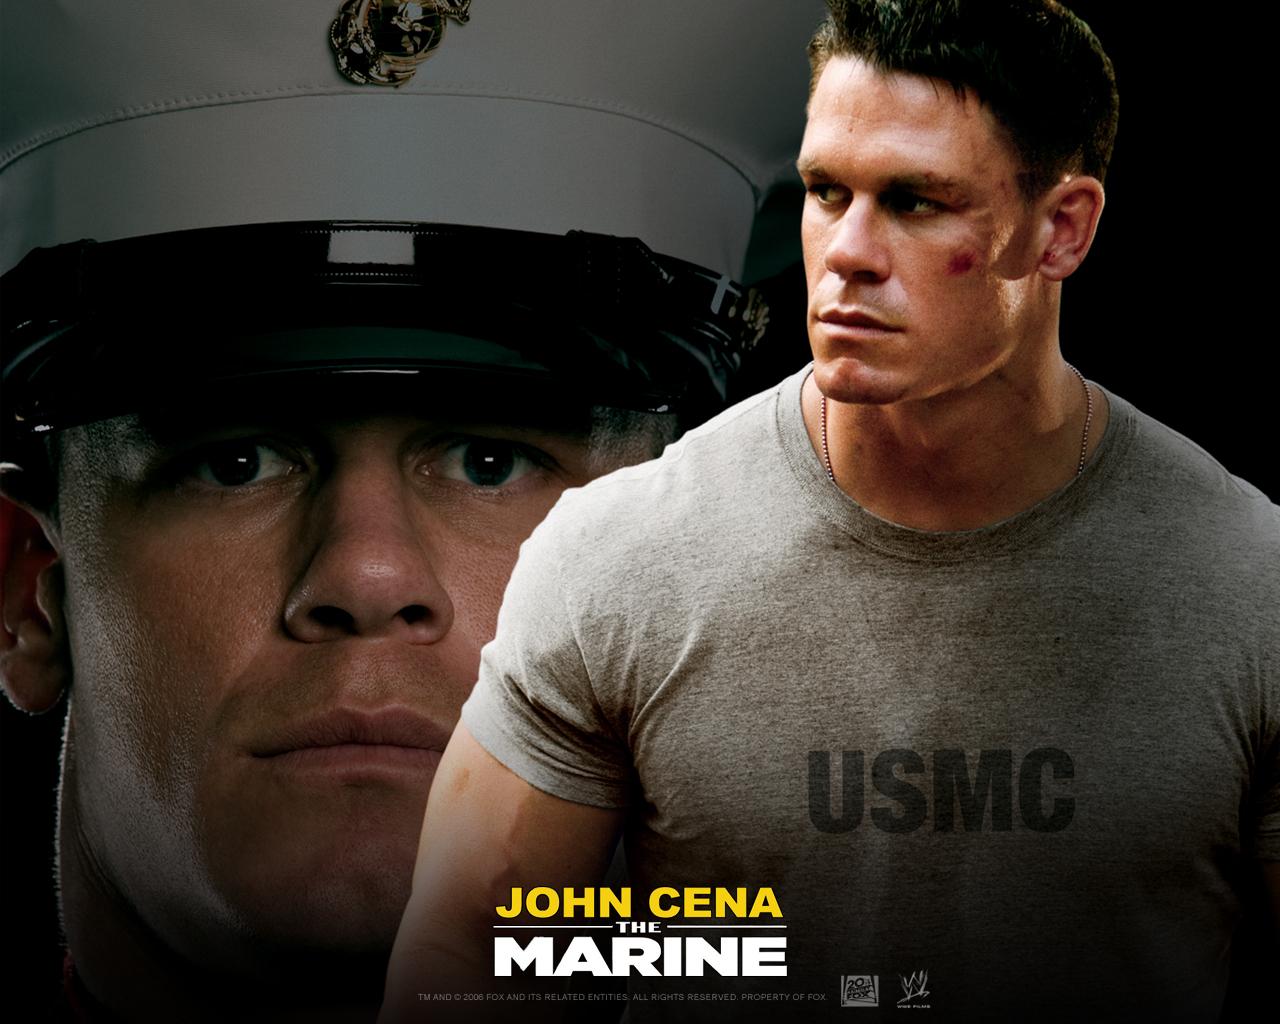 http://3.bp.blogspot.com/-oGp8GtDW4Hc/UG3TqaxMvPI/AAAAAAAAHNQ/9Td_6AJwqEk/s1600/John_Cena_in_The_Marine_Wallpaper_2_1280.jpg